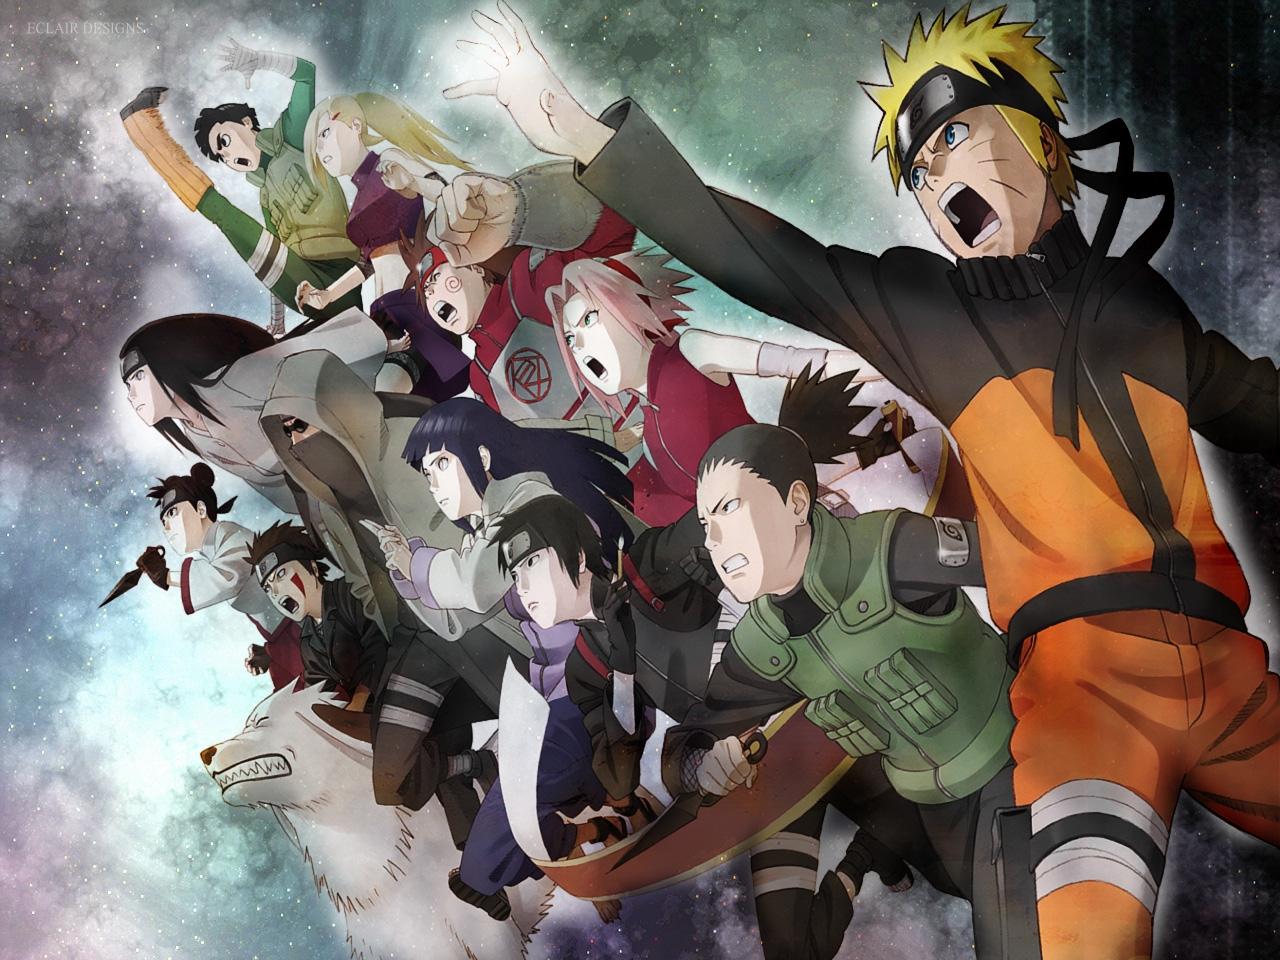 Naruto group manga